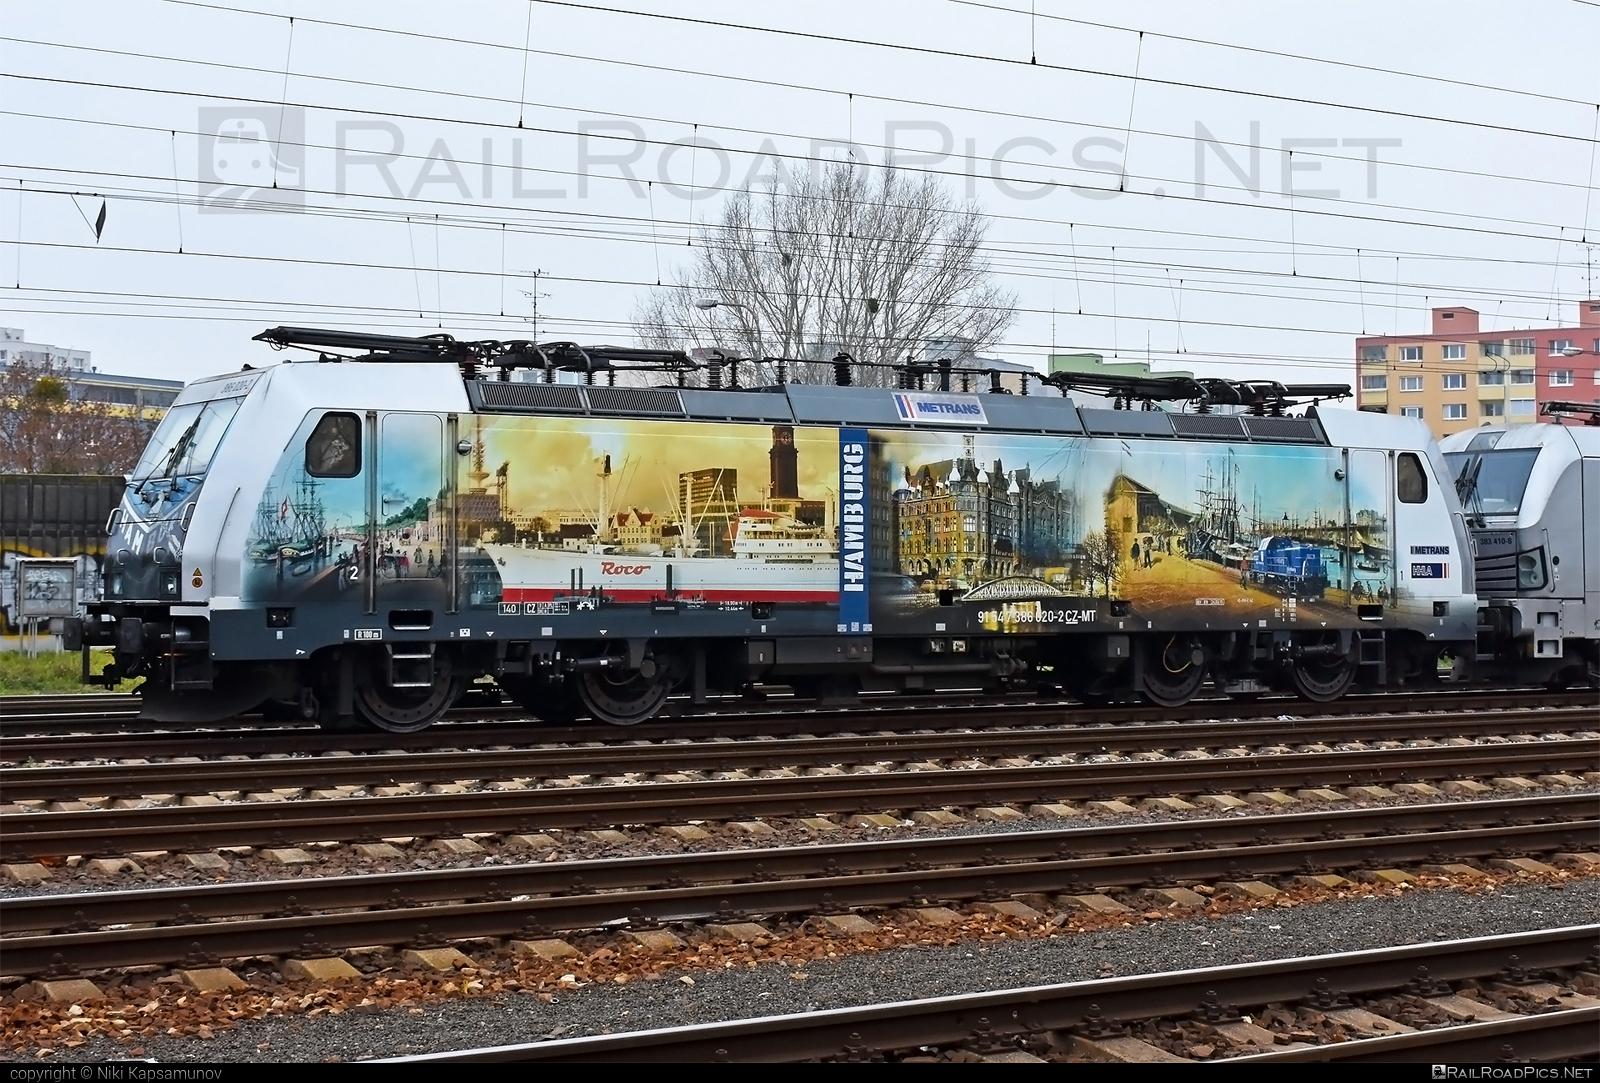 Bombardier TRAXX F140 MS - 386 020-2 operated by METRANS, a.s. #bombardier #bombardiertraxx #hamburg #hhla #metrans #traxx #traxxf140 #traxxf140ms